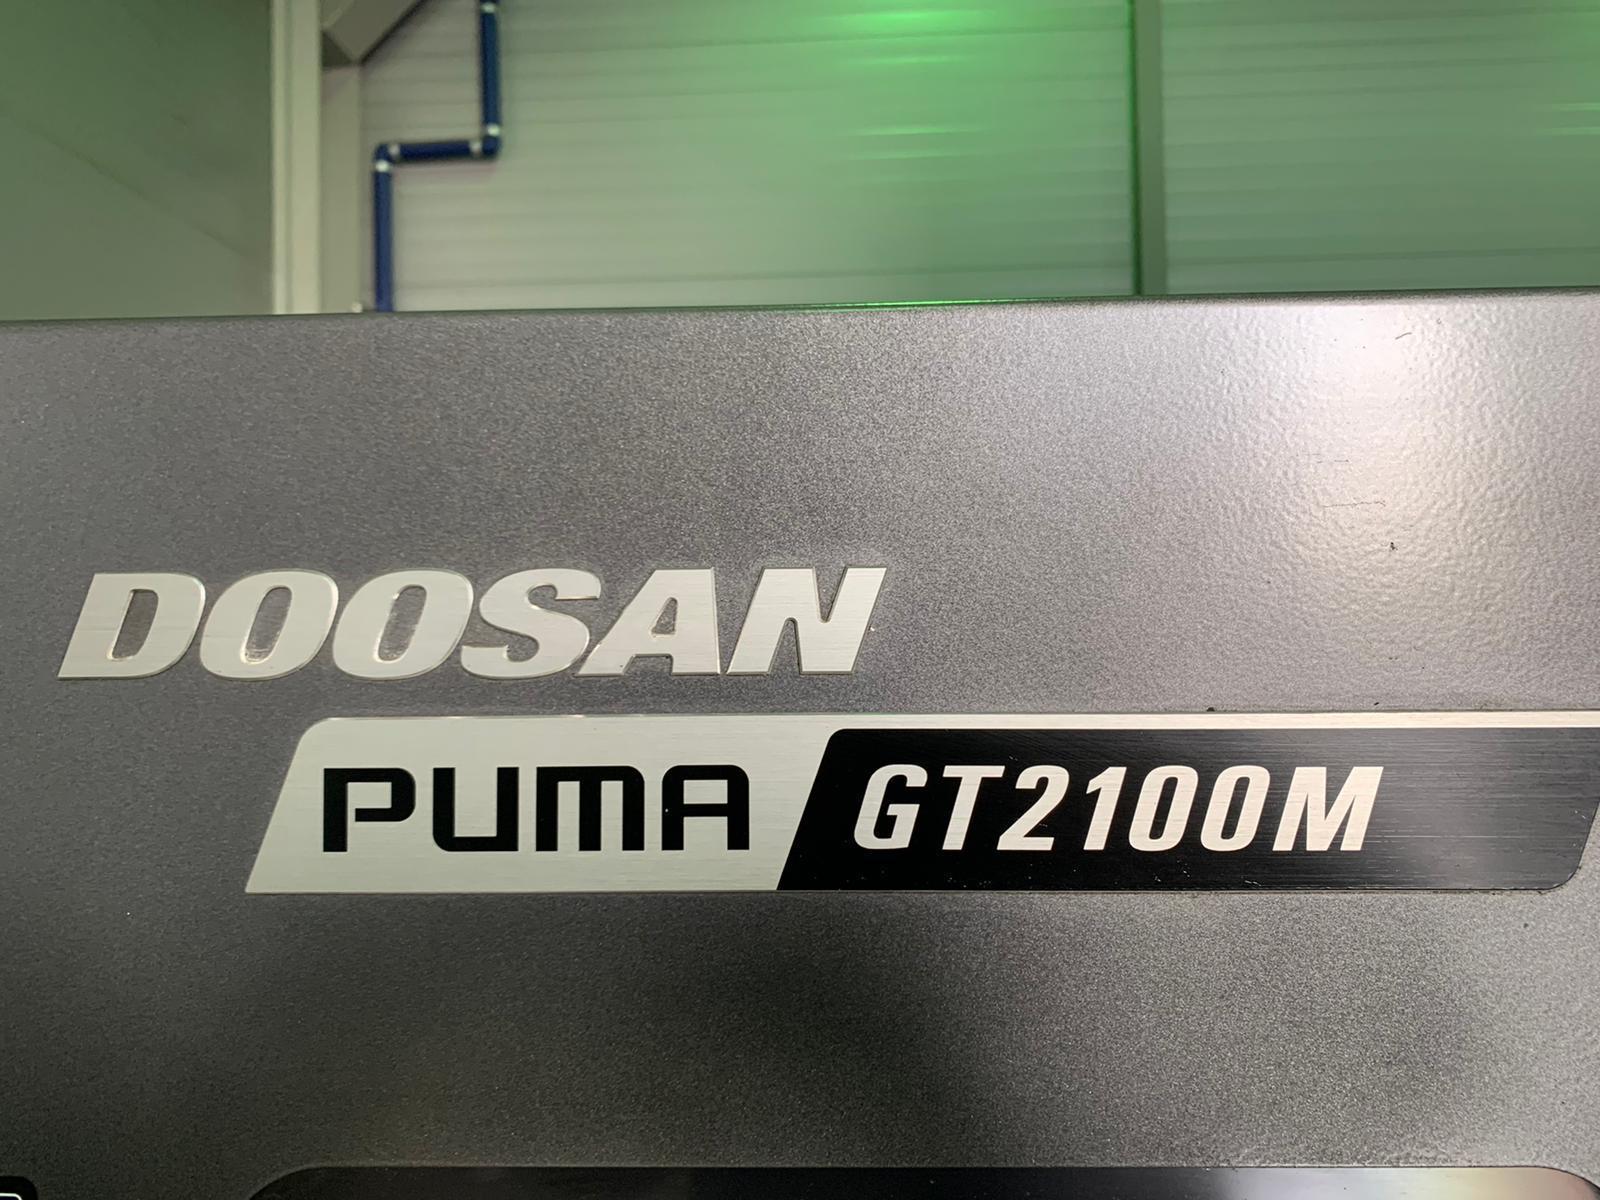 Doosan Puma GT2100M Horizontal CNC Lathe (2016)